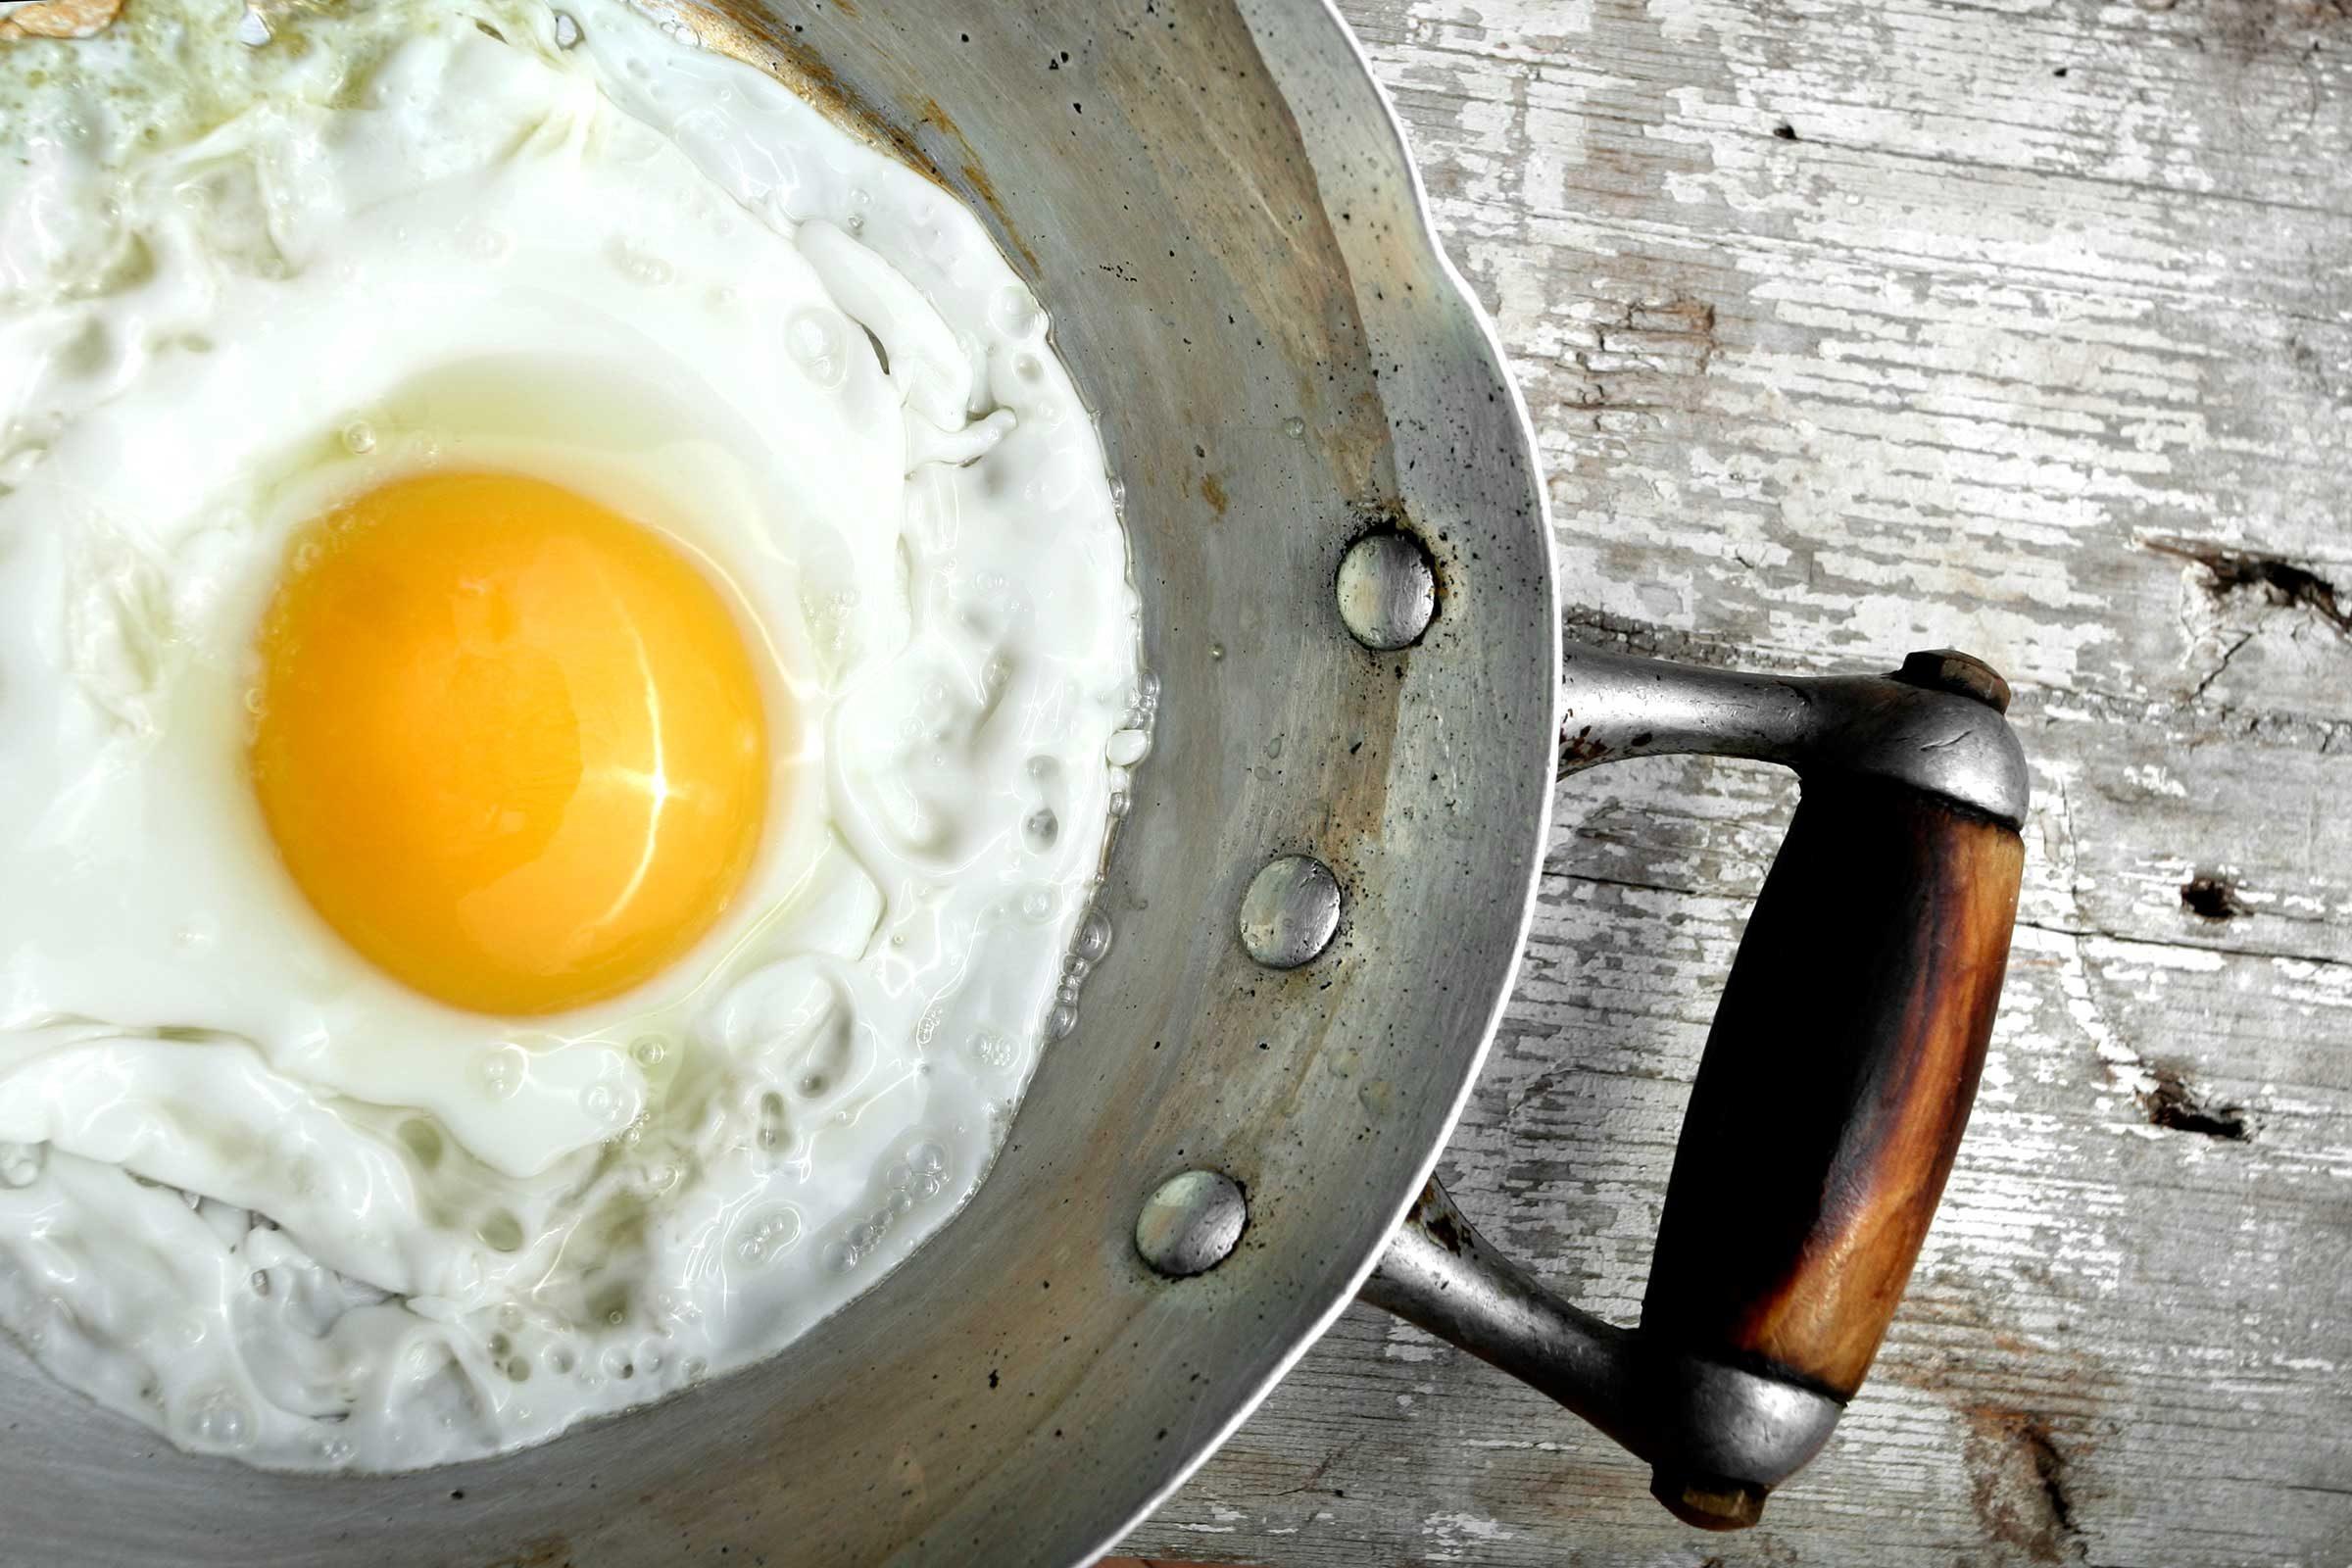 Eat the whole egg